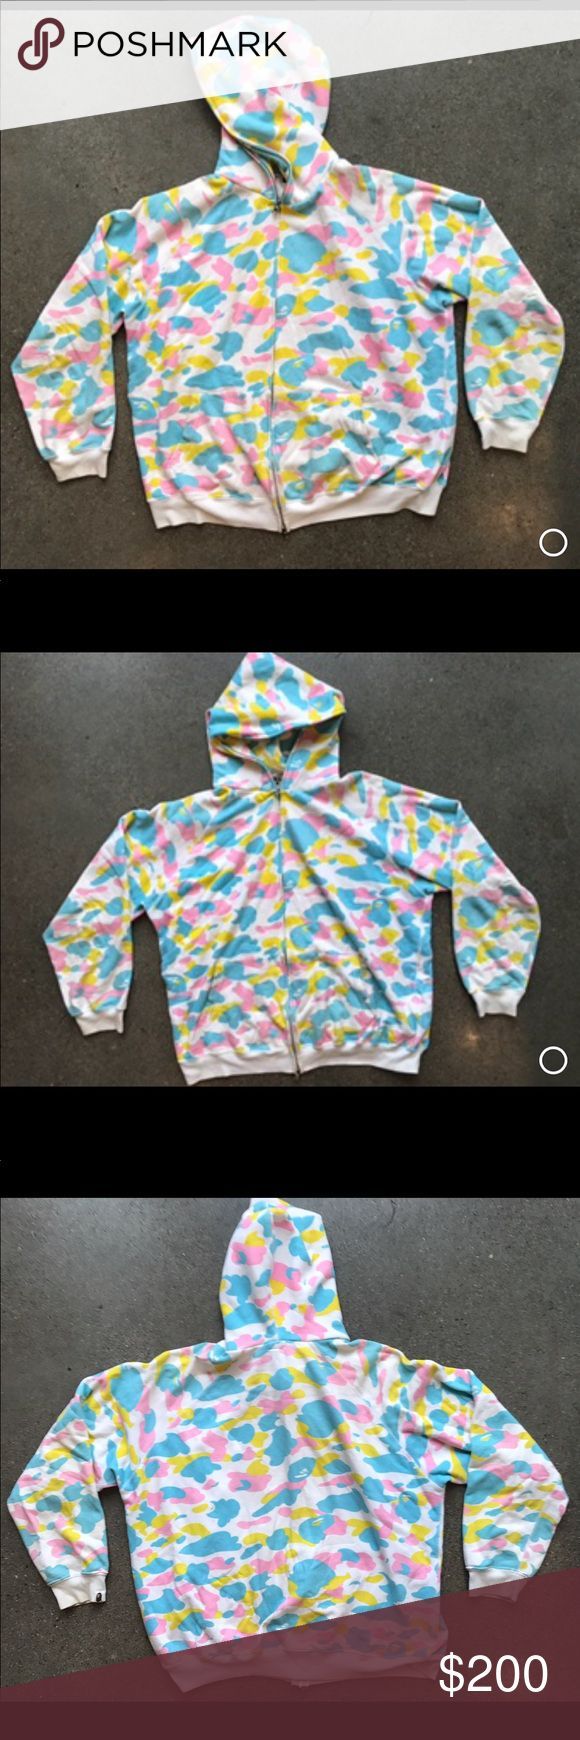 ♻️ A Bathing Ape Full Zip Hooded Sweatshirt XL A Bathing Ape Colorful Full Zip Hooded Jacket   Size - XL  Color - Pink/White/Yellow/Blue  Good condition   Authentic A Bathing Ape Shirts Sweatshirts & Hoodies